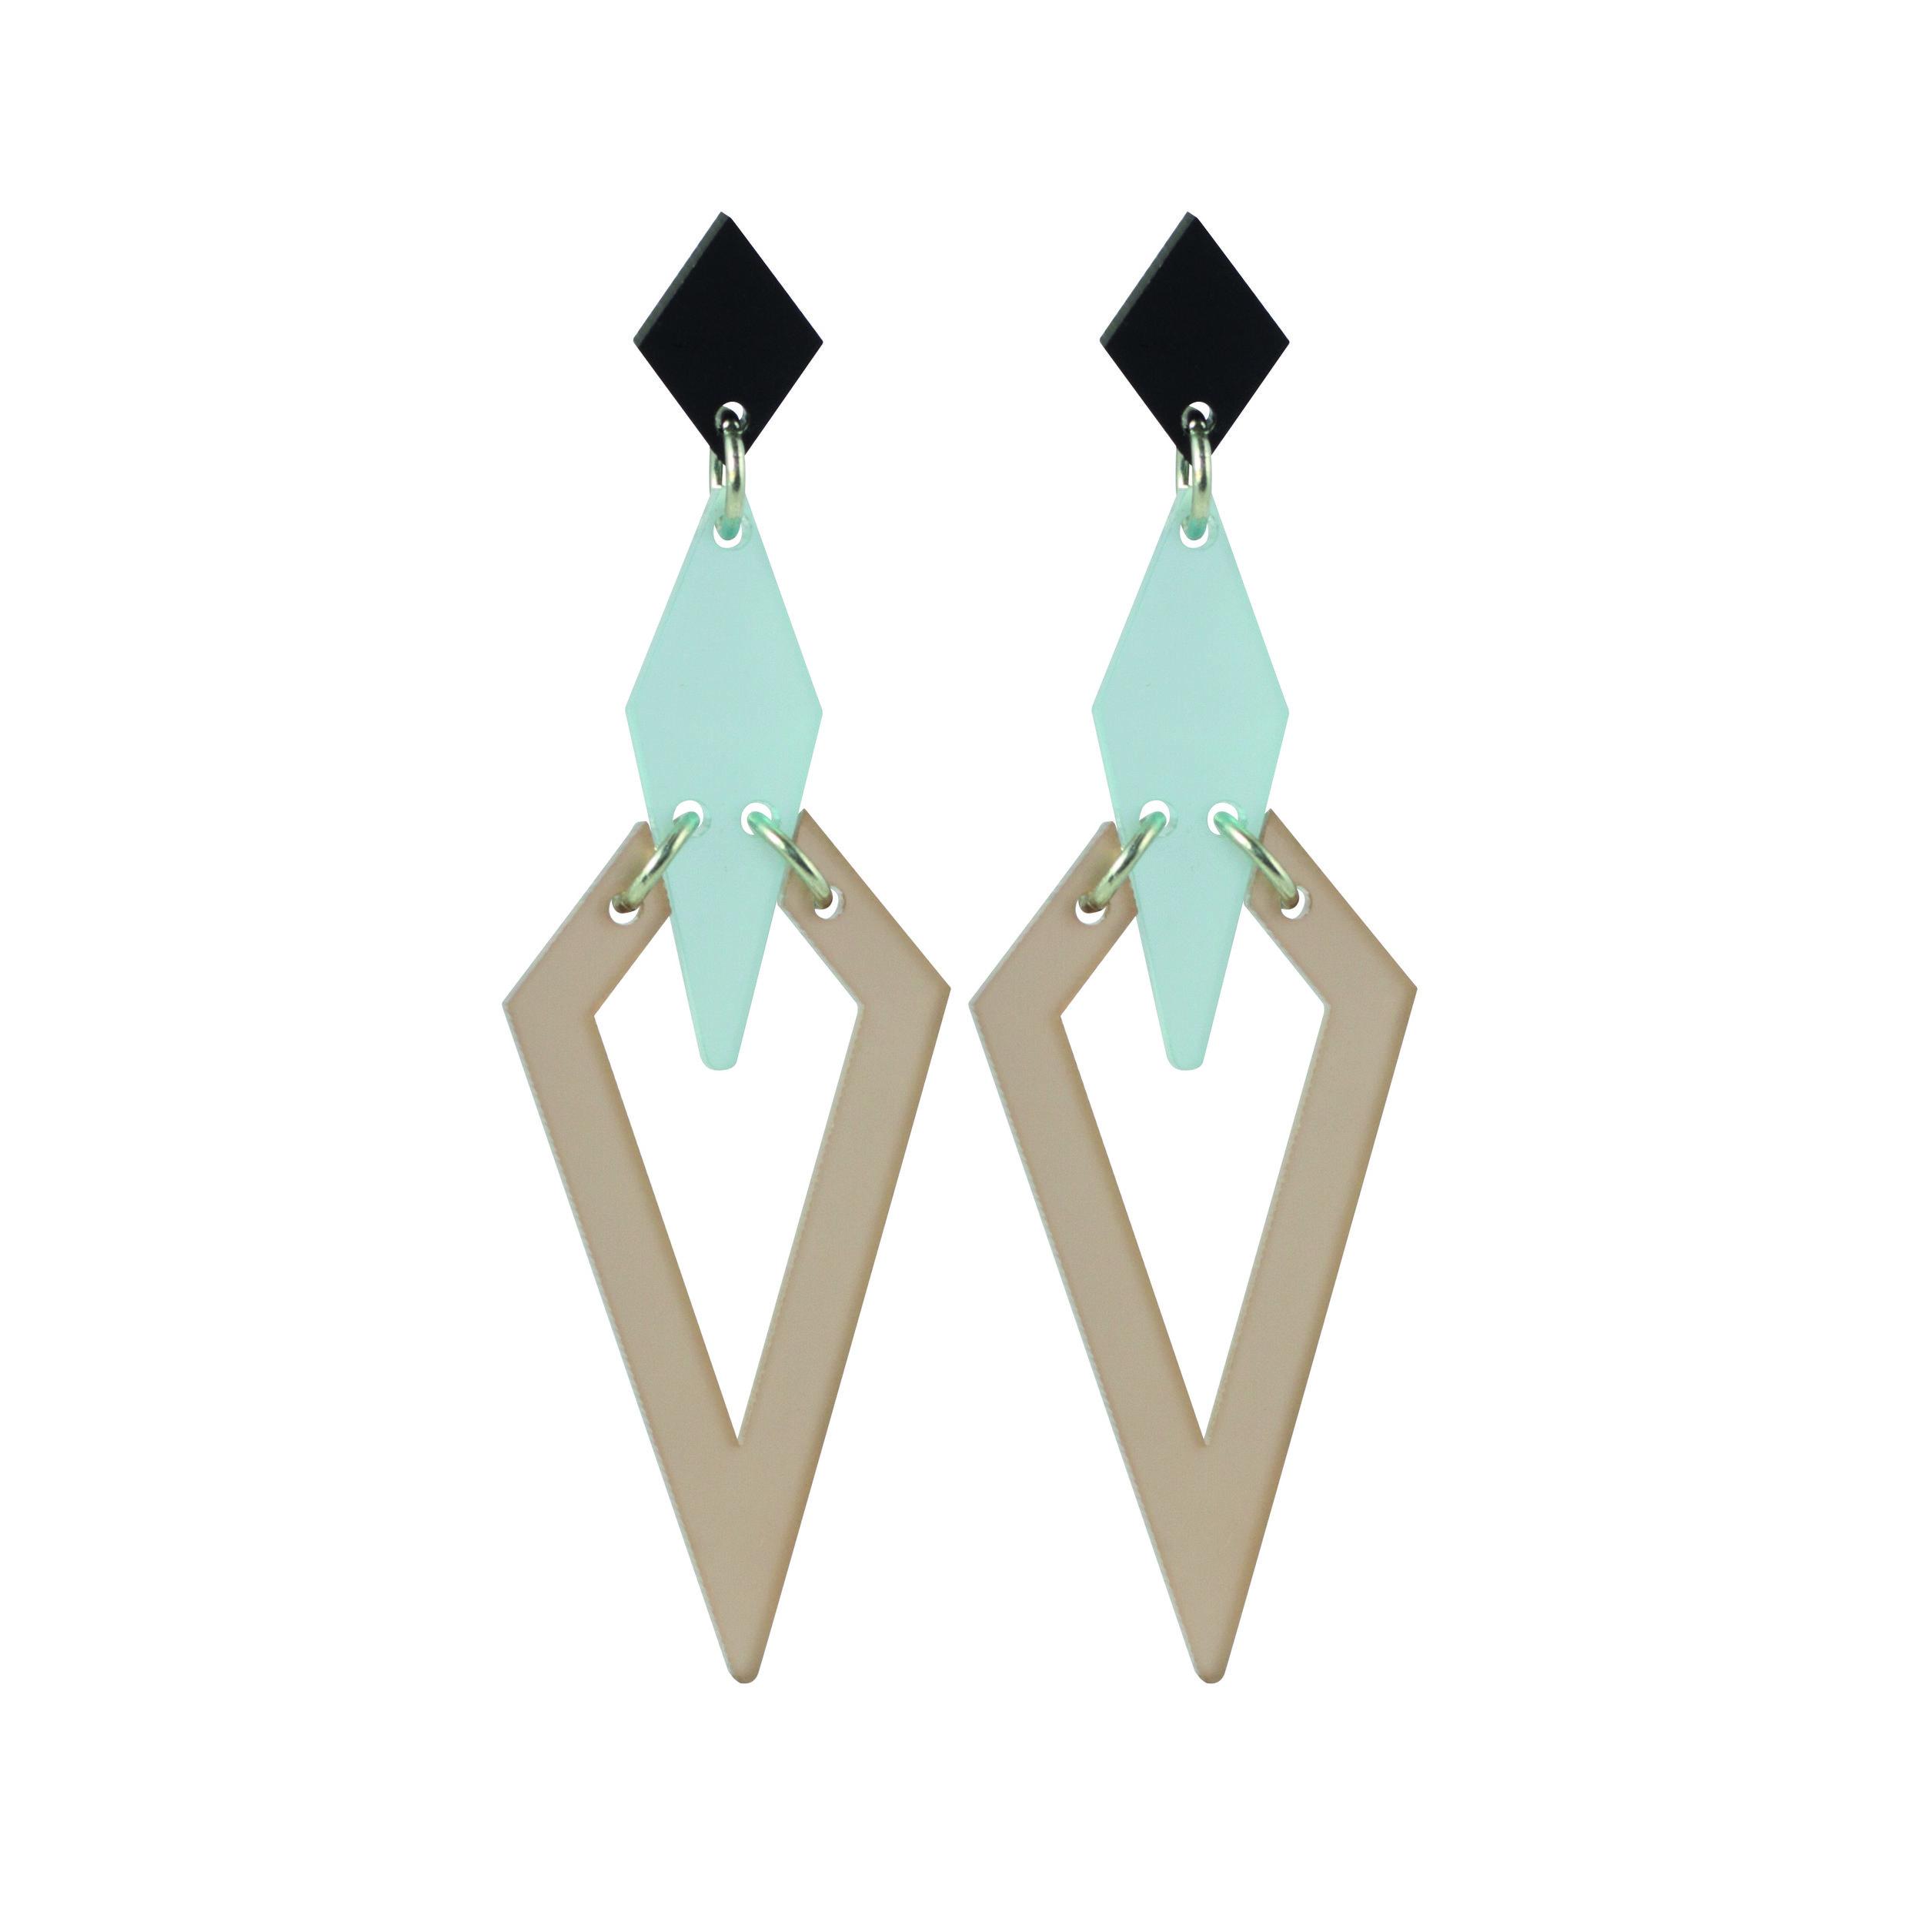 Violet & Wren x Toolally Iris Earring in Arctic Frost